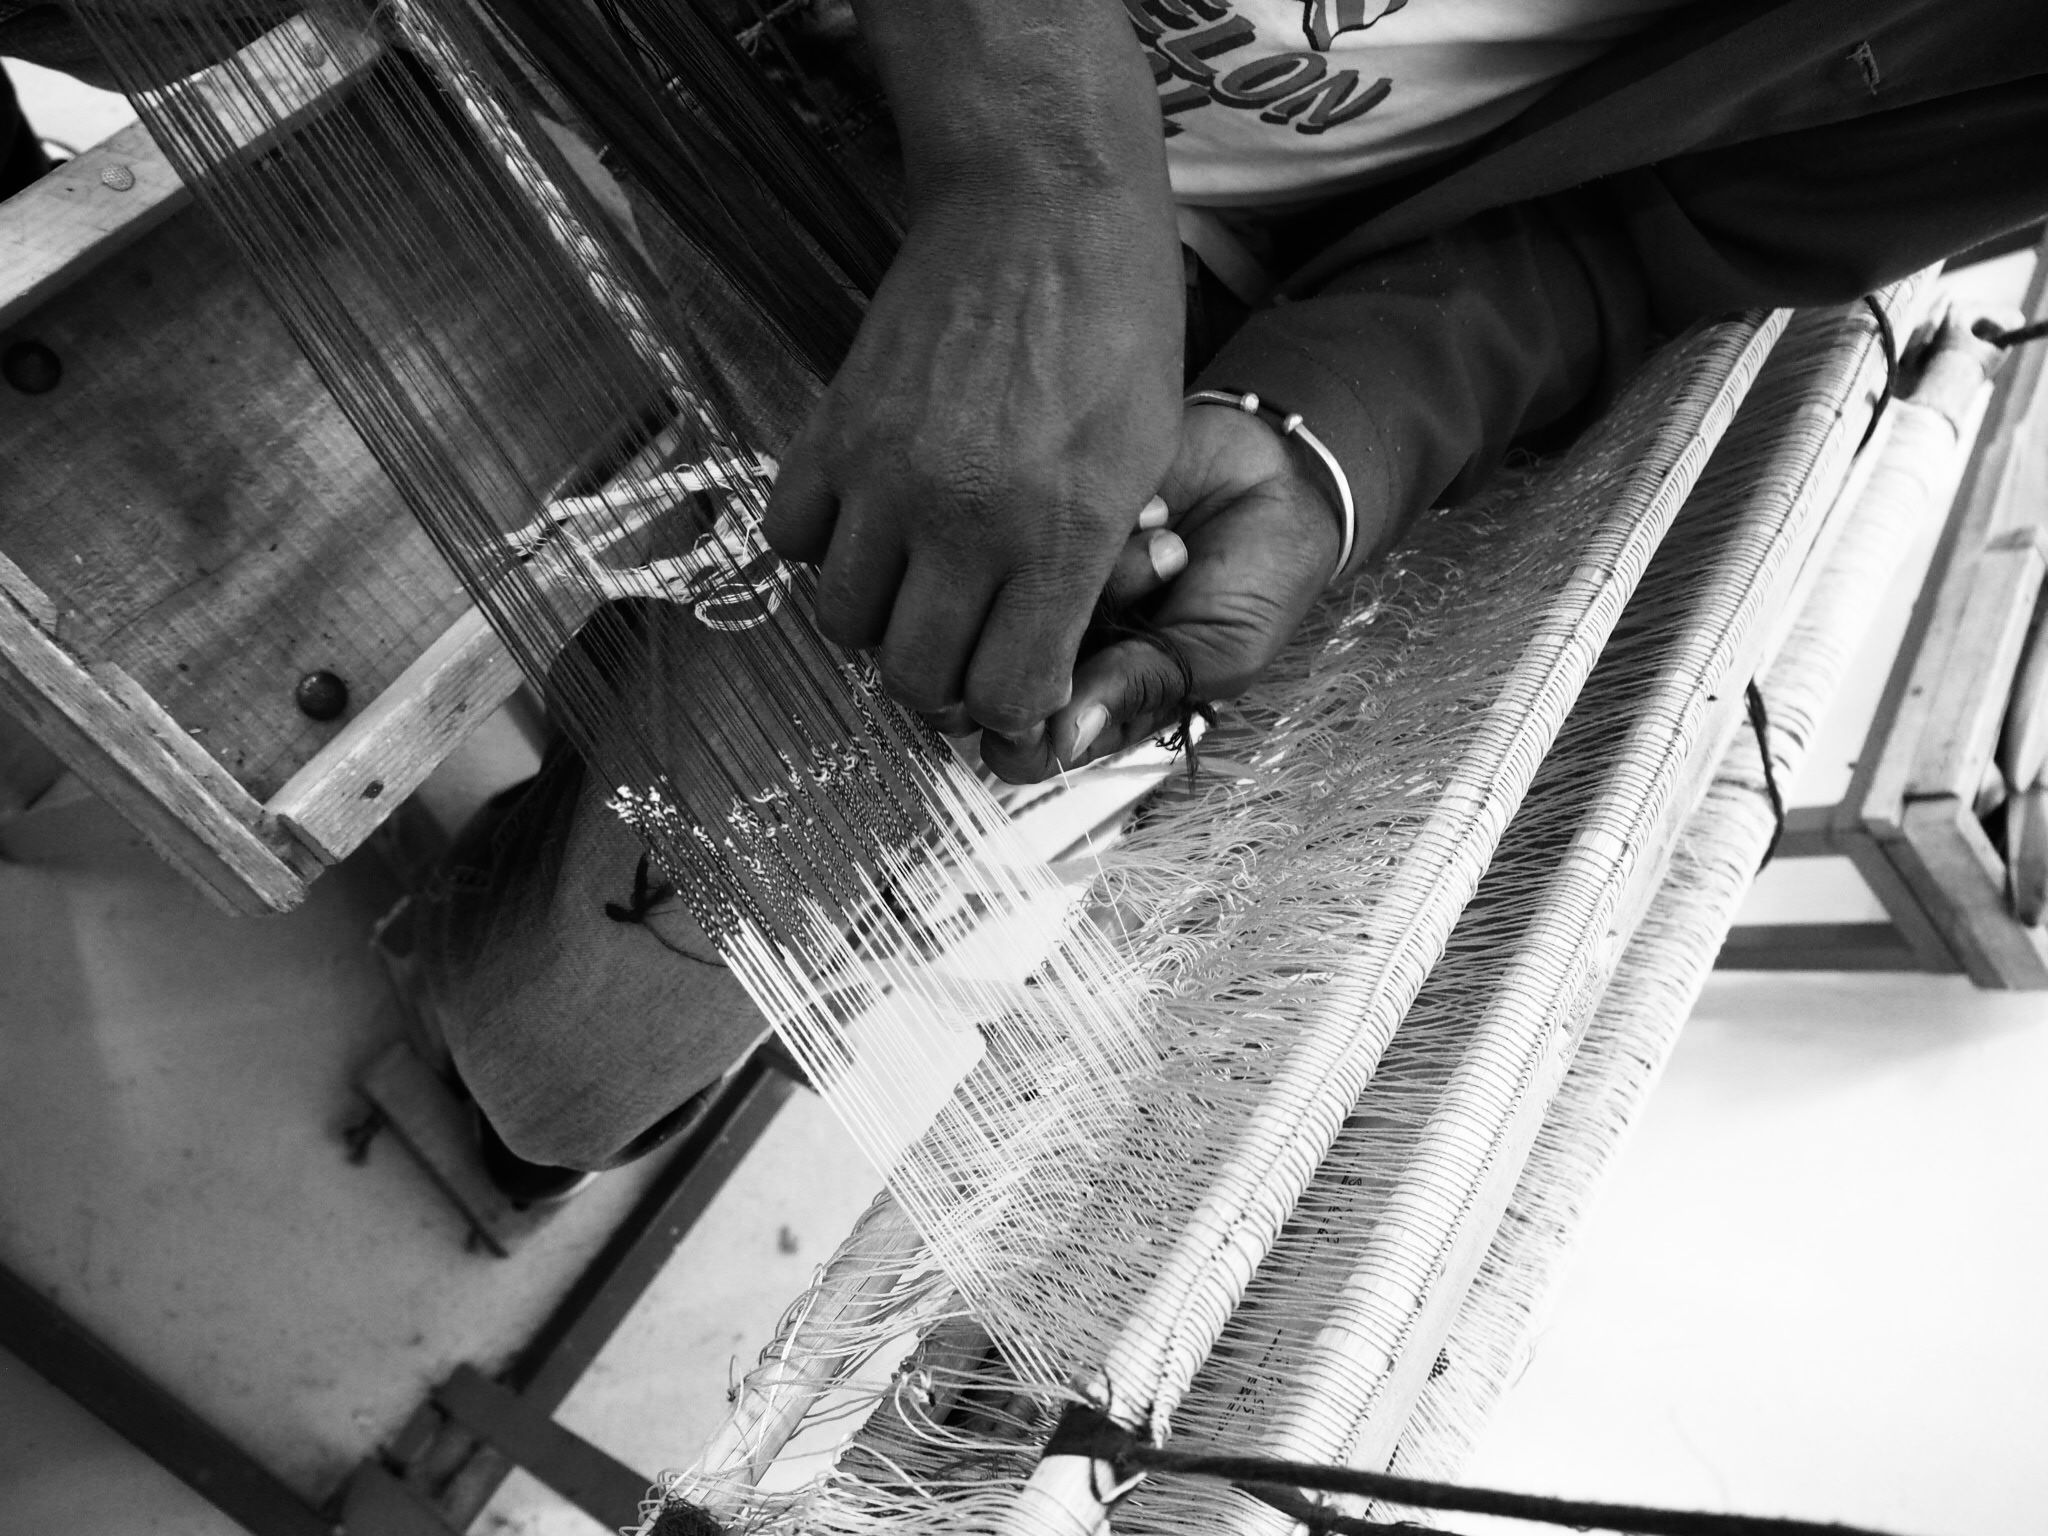 Sera Helsinki Artisan Dyeing Thread Used in Towel Making